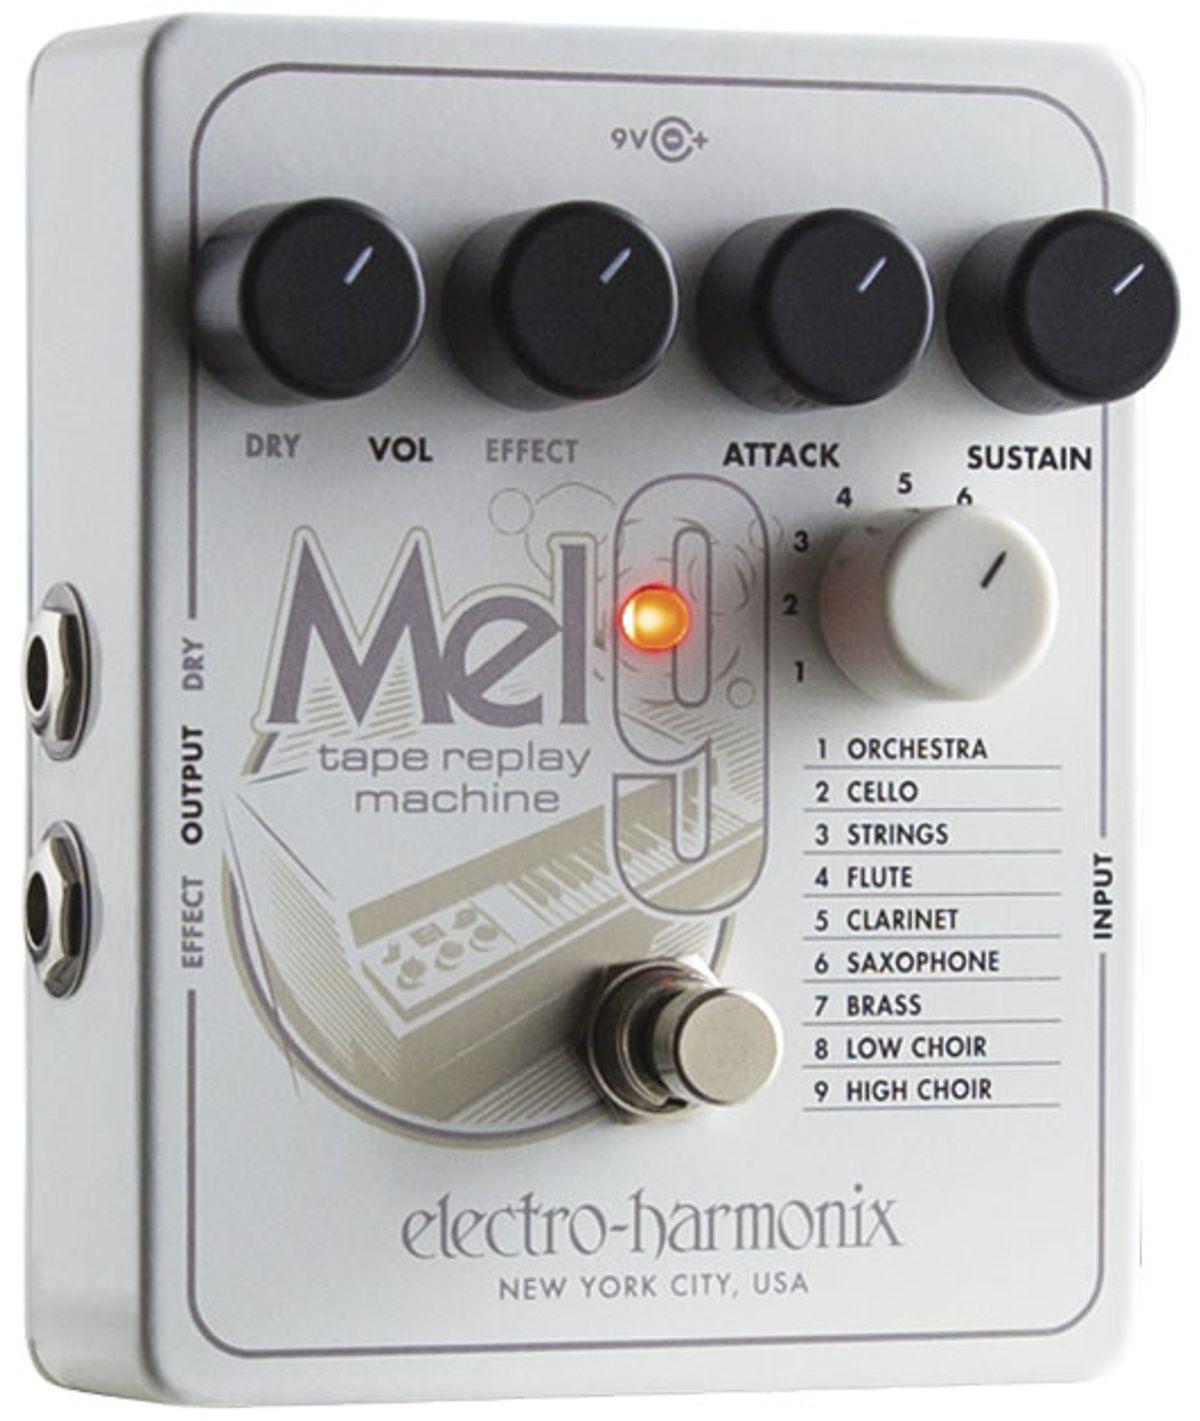 Electro-Harmonix Mel9 Review